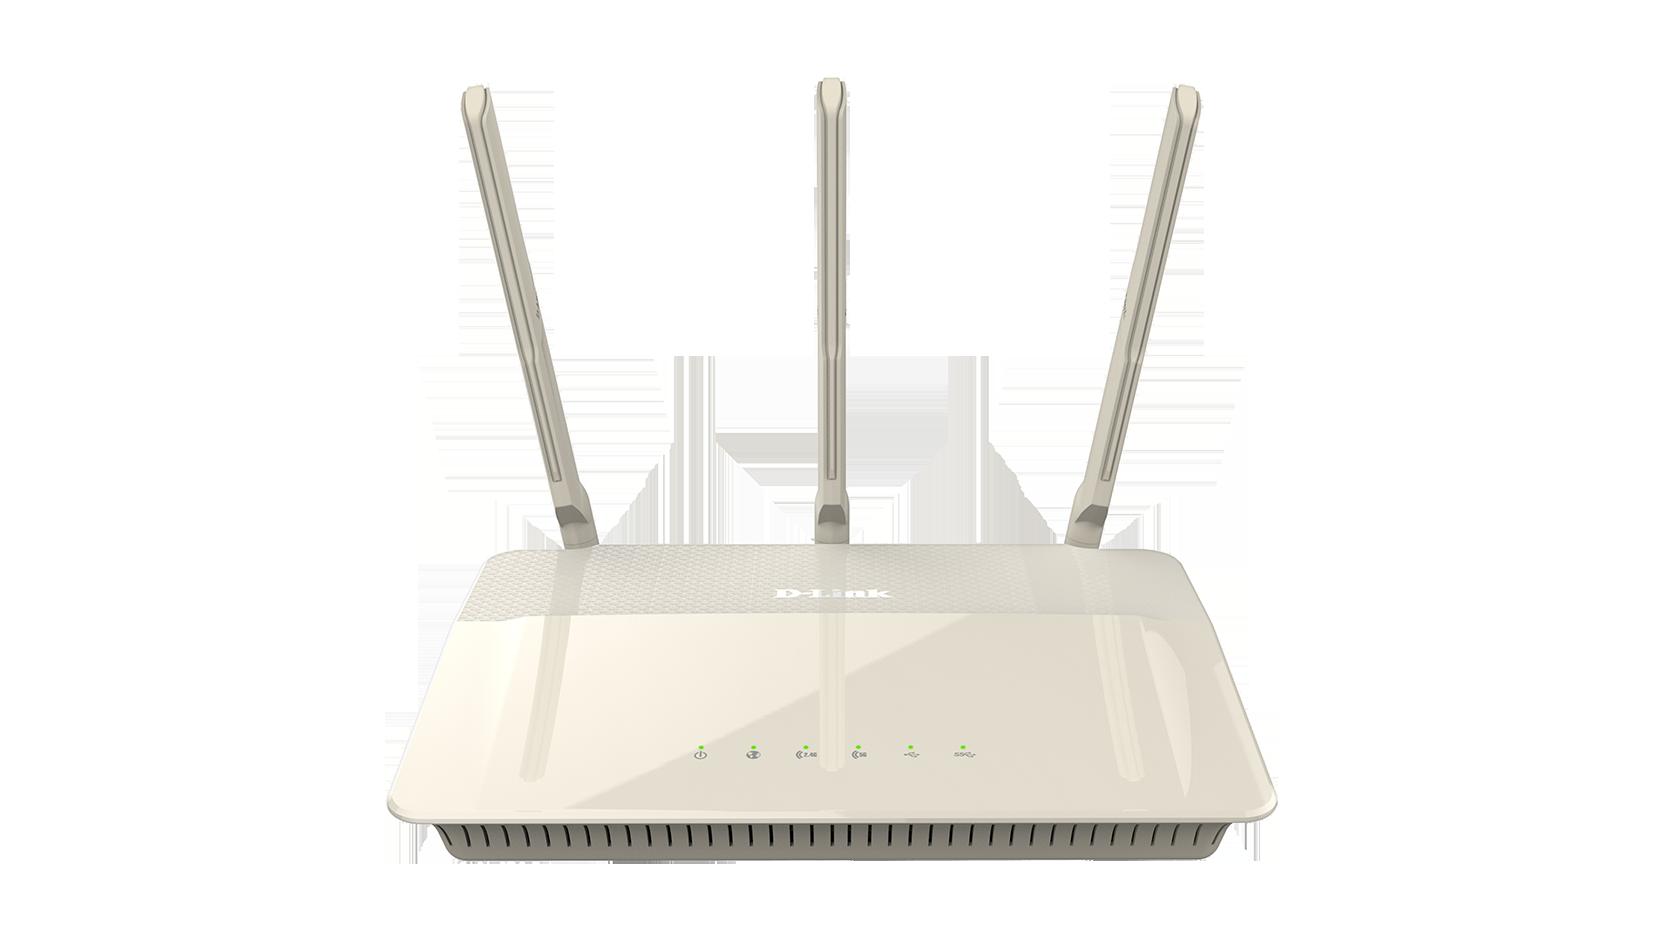 DIR-880L Wireless AC1900 Dual-Band Gigabit Cloud Router | D-Link ...